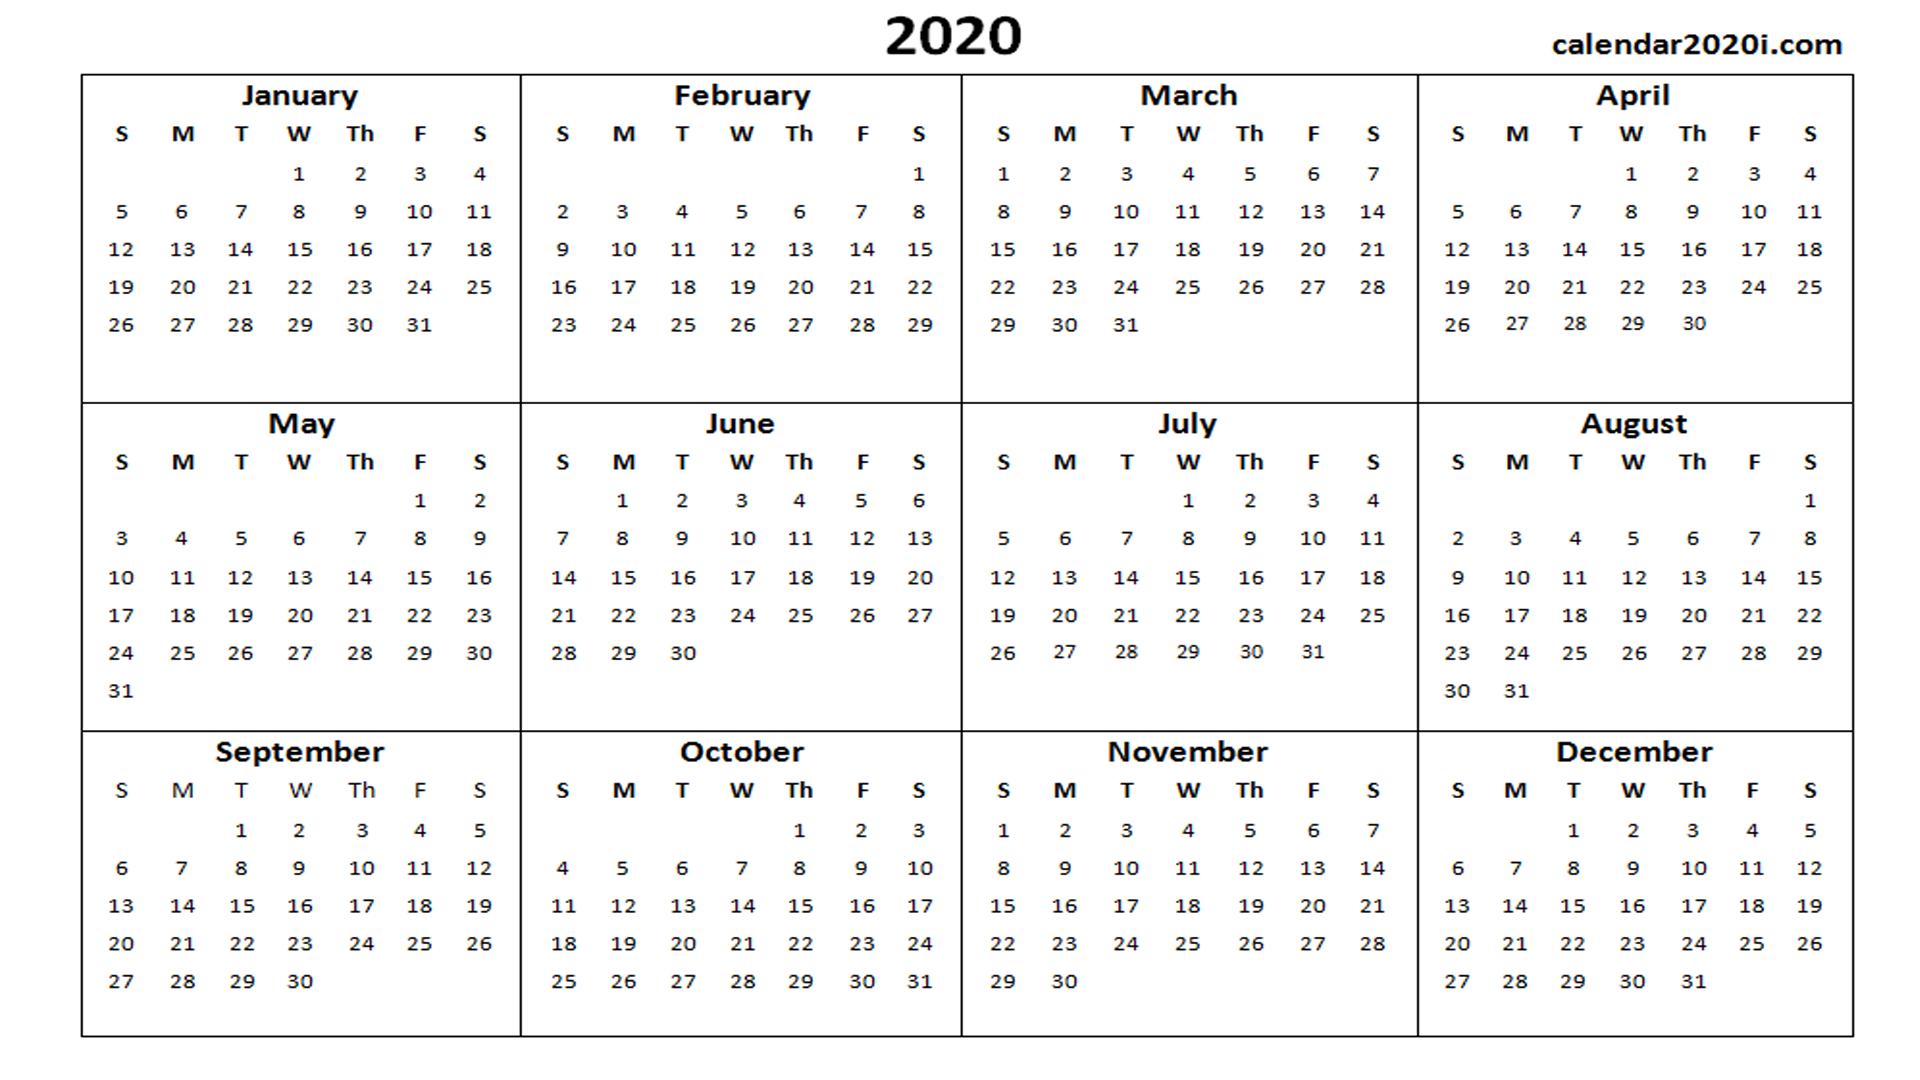 2020 Calendar Printable Template Holidays, Word, Excel, Pdf in Word Calendar Template 2020